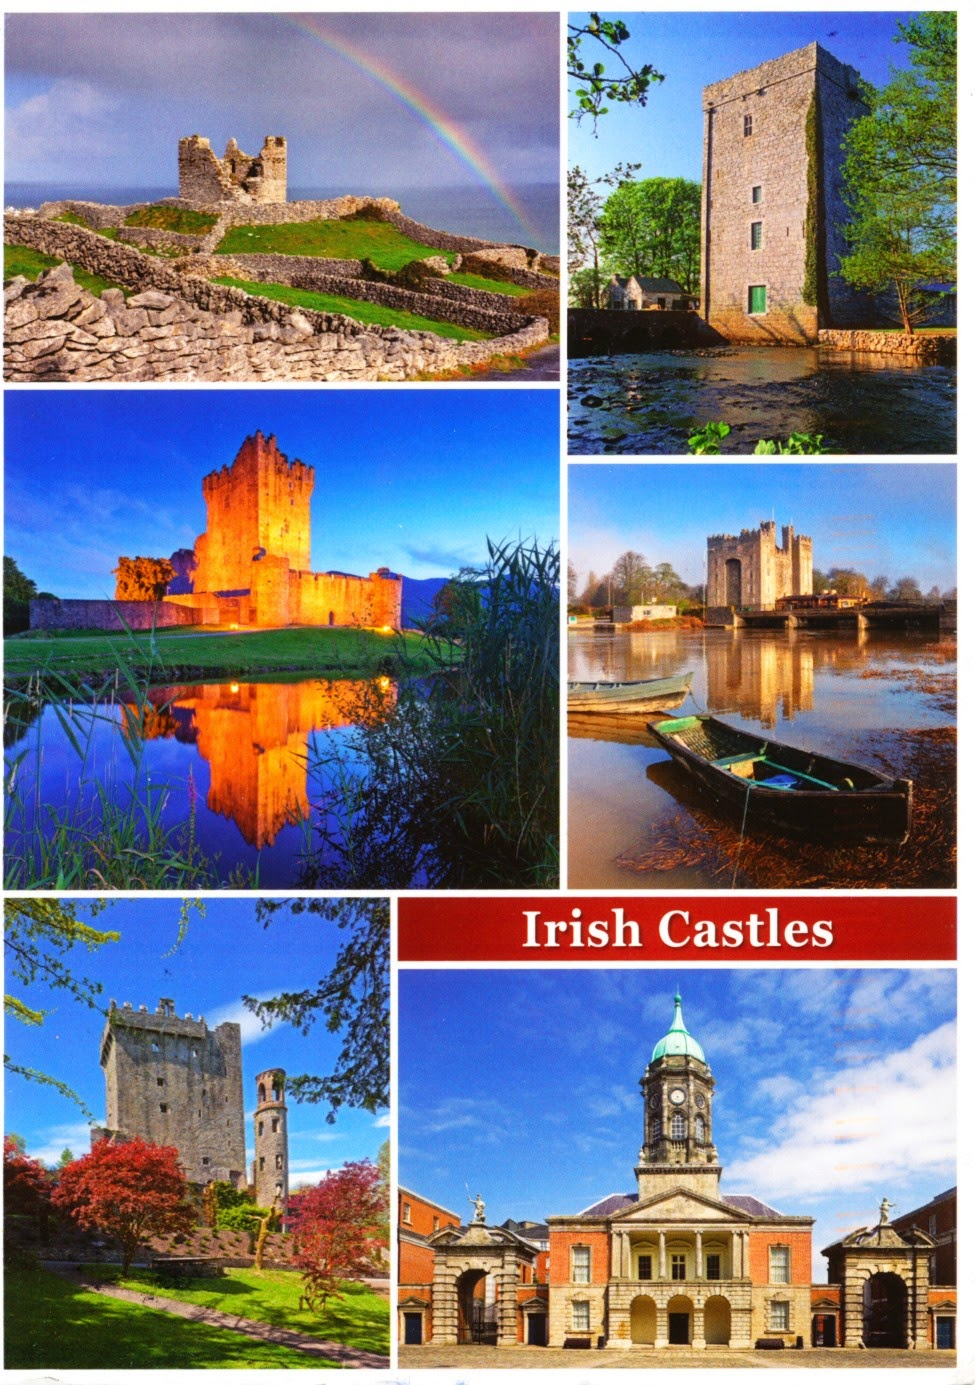 postcard, ireland, thoor ballylee, bunratty castle, blarney castle, ross castle